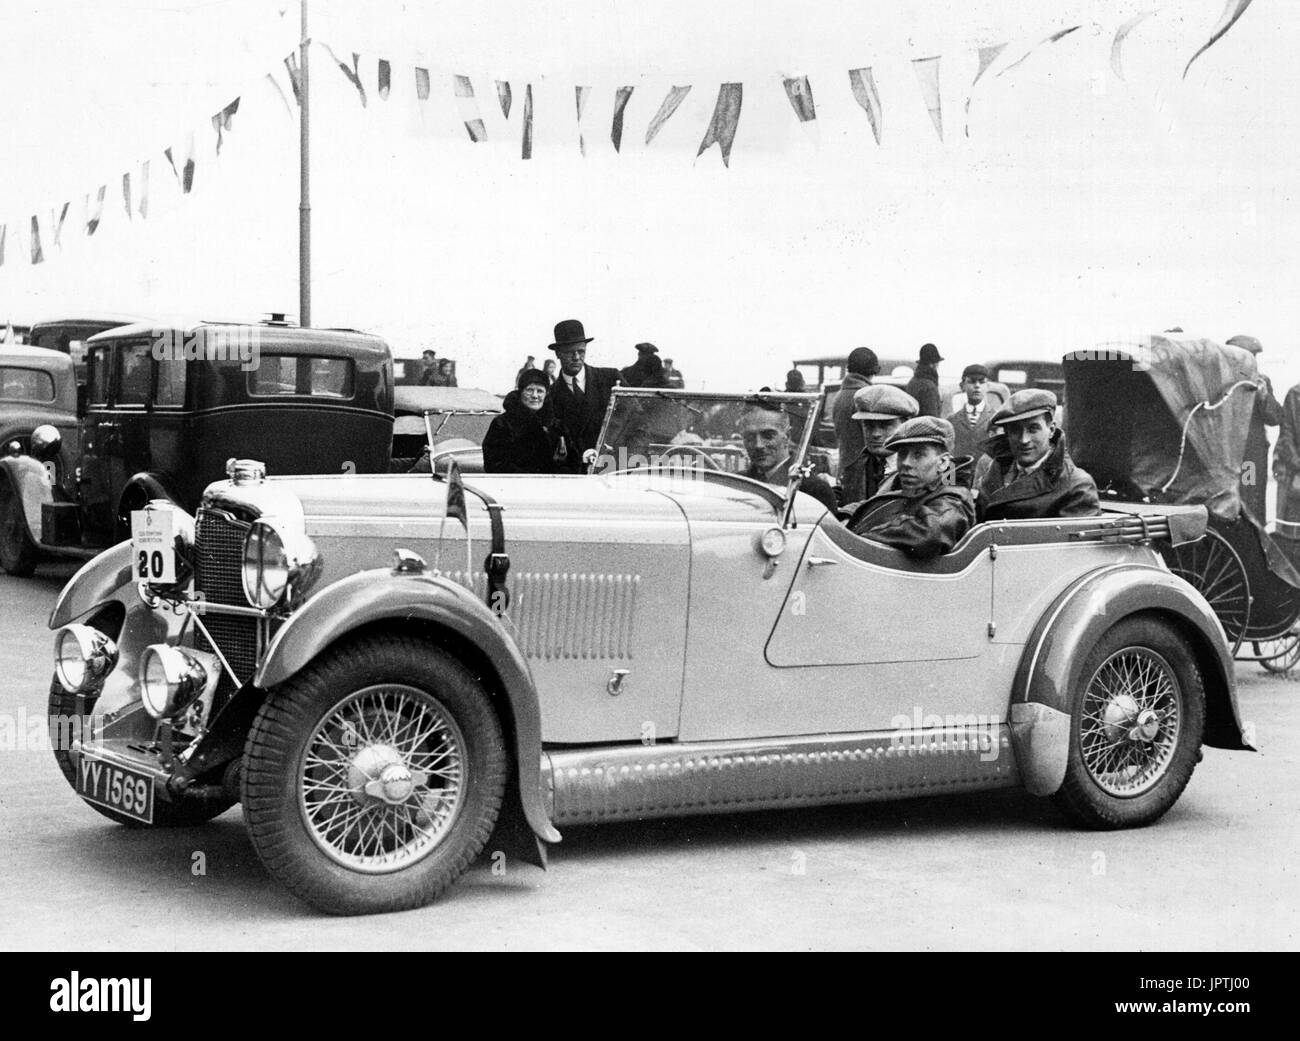 1932 Rover Speed 20 - Stock Image